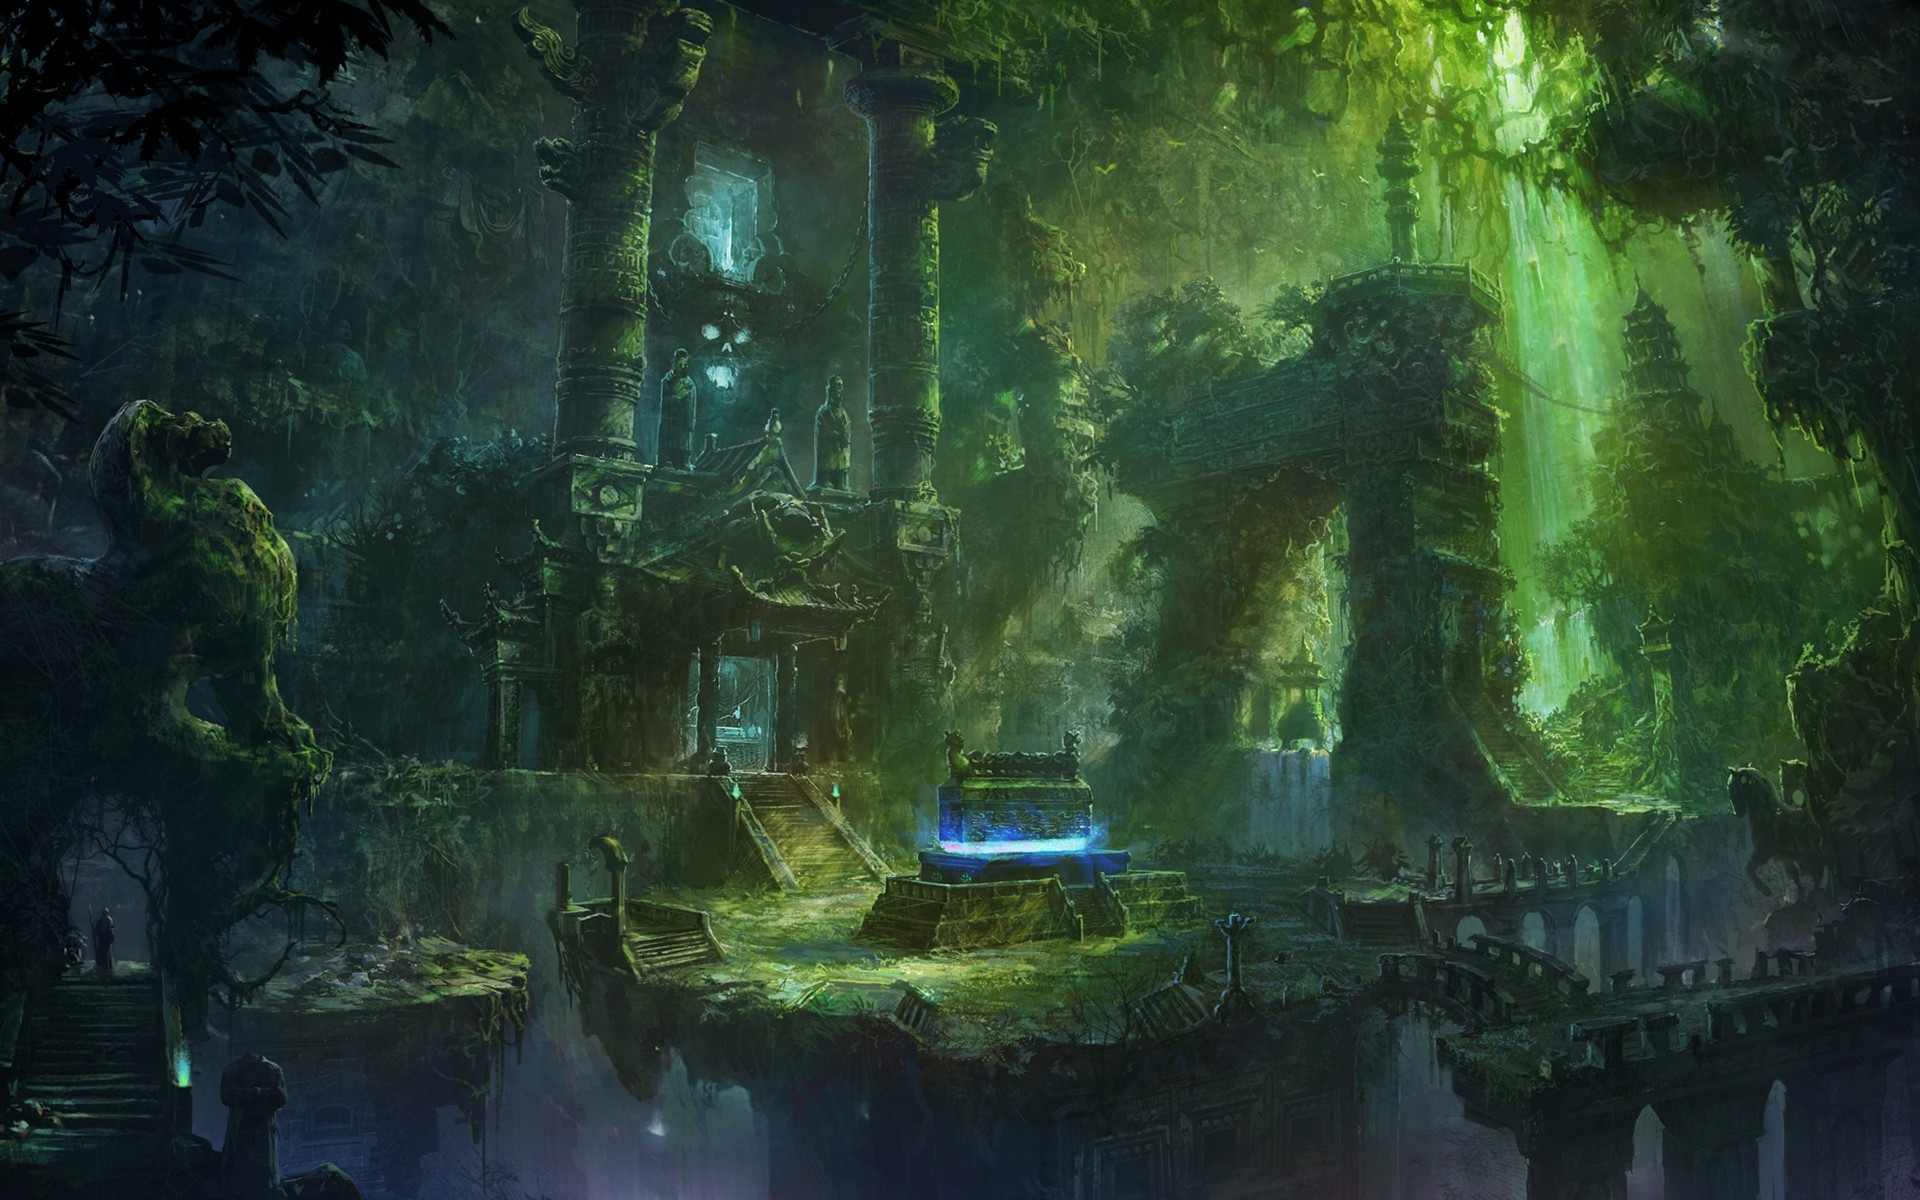 Fantasy forest ruins buildings jungles wallpaper ...